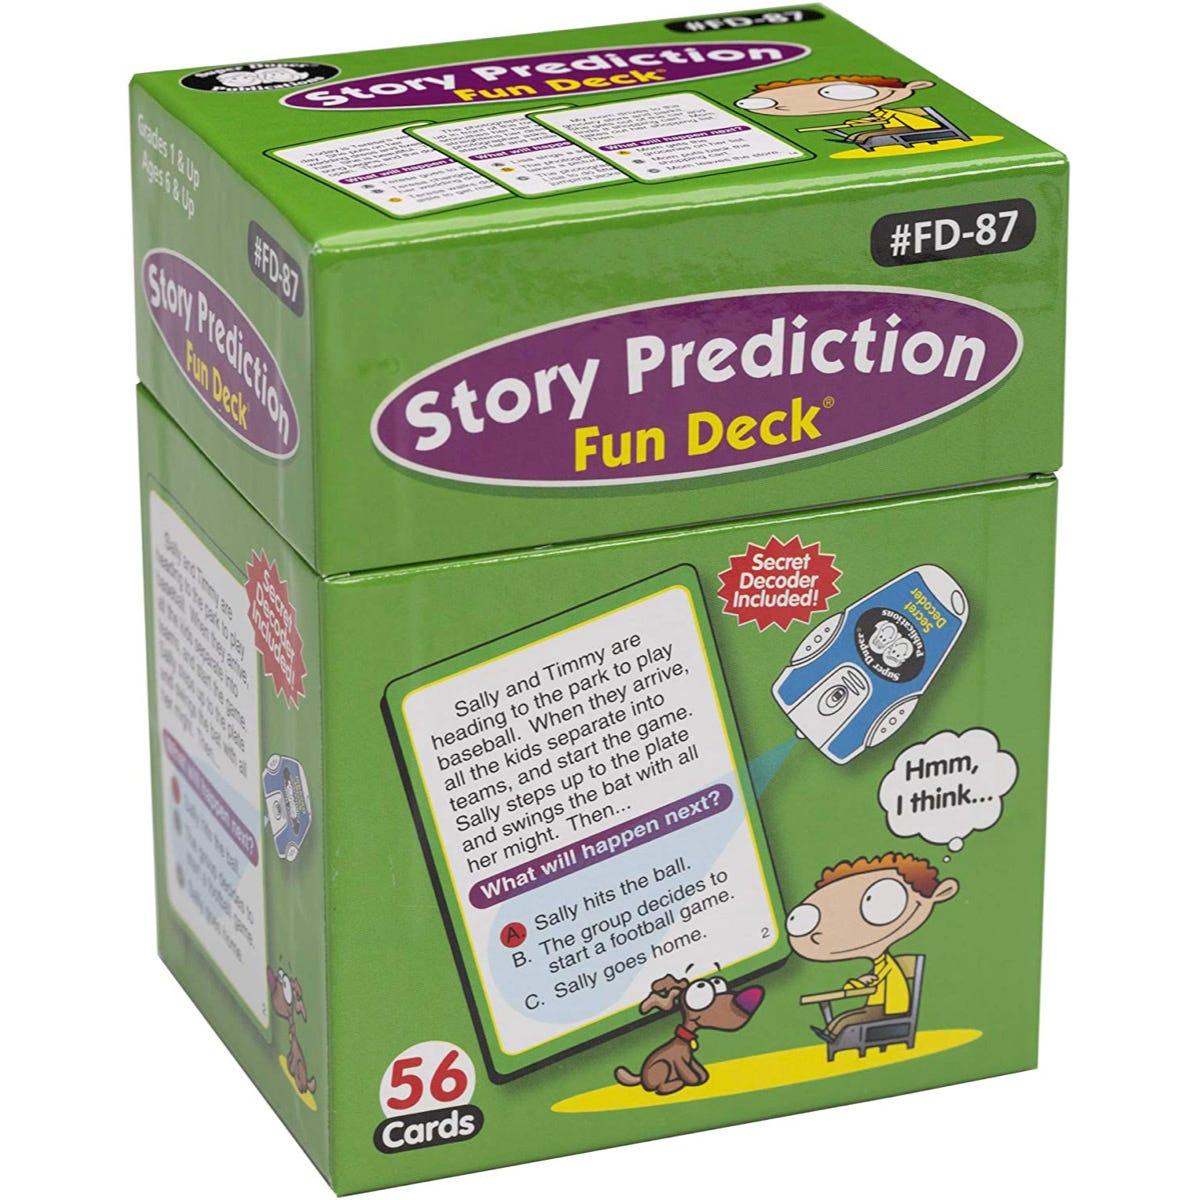 Story Prediction Fun Deck